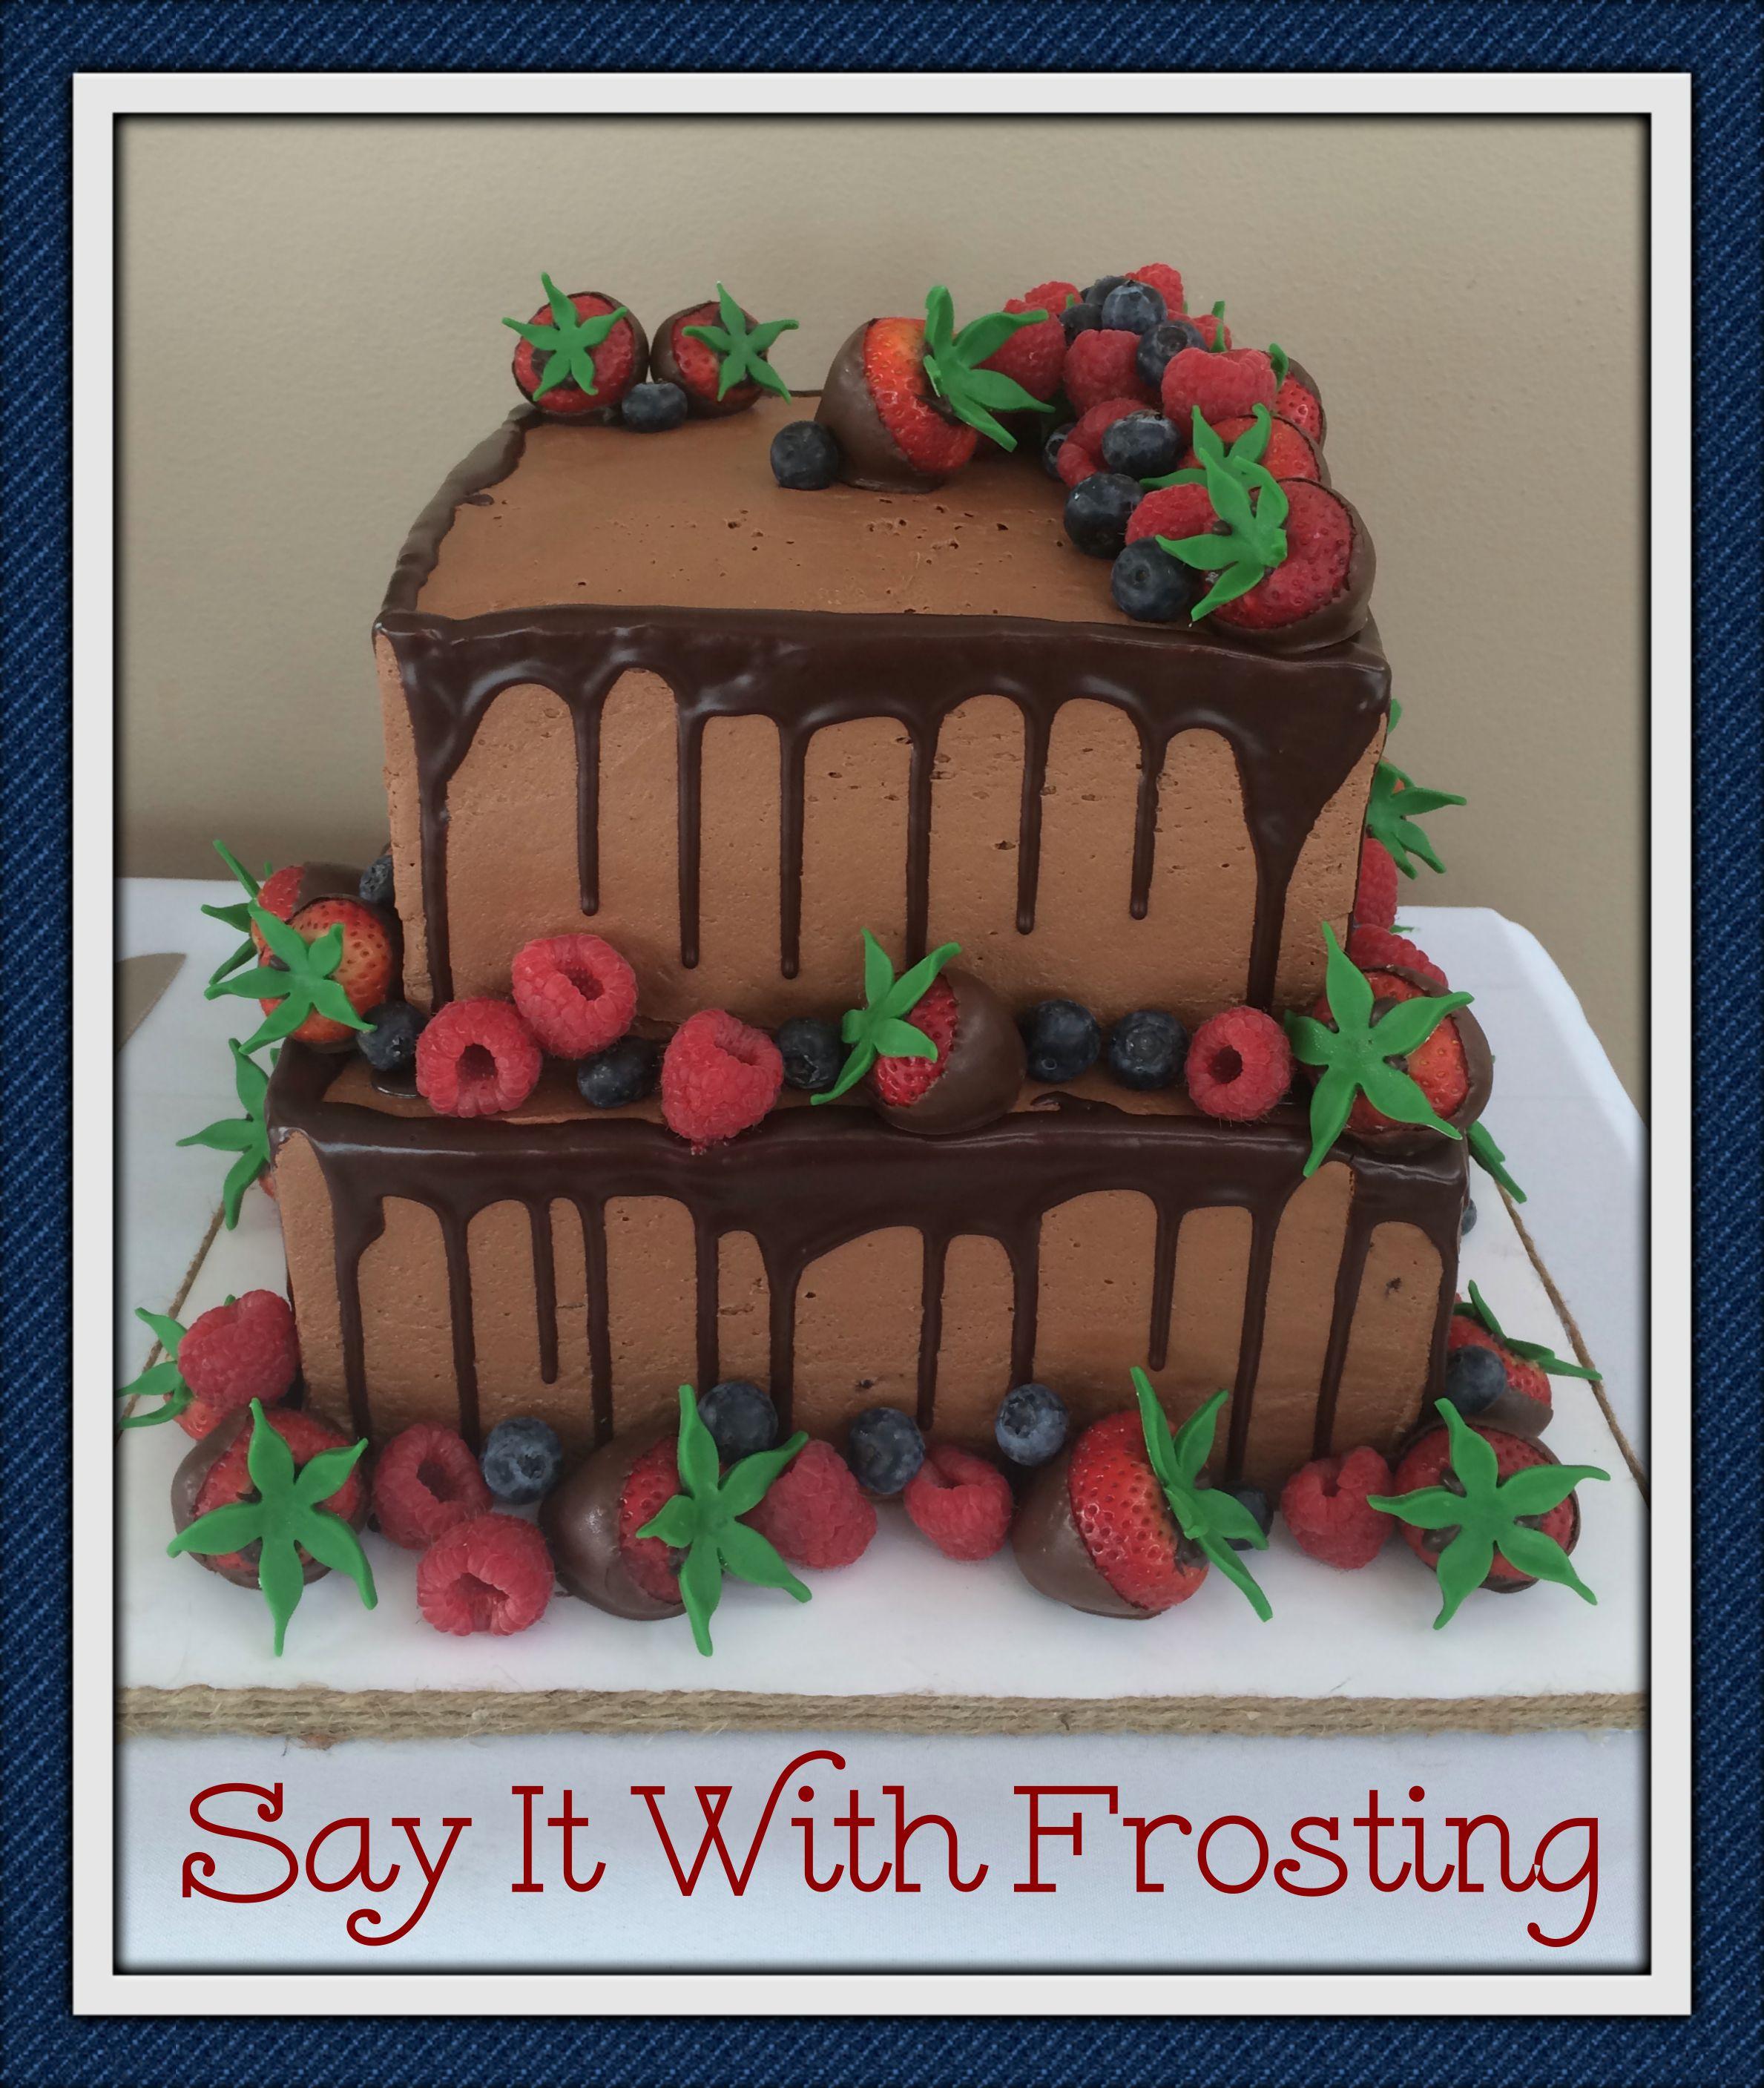 Pensacola Destination Wedding Cakes Chocolate Grooms Cake With Fresh Fruit For An Orange Beach